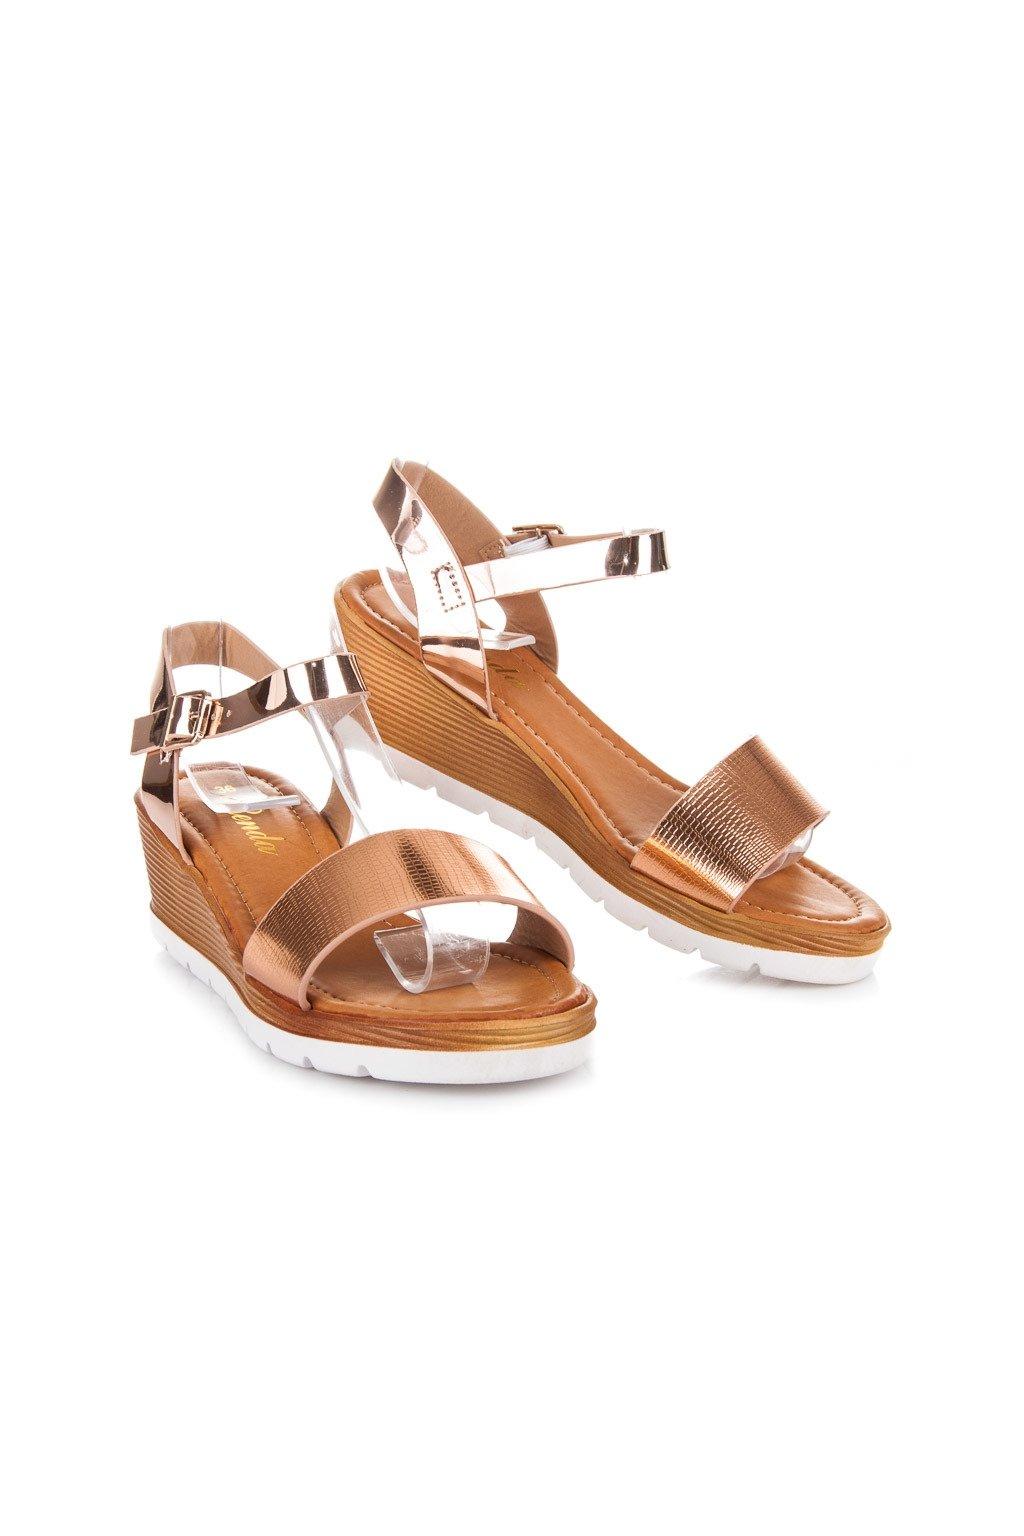 180207 ruzove lakovane sandale 860 22ch big